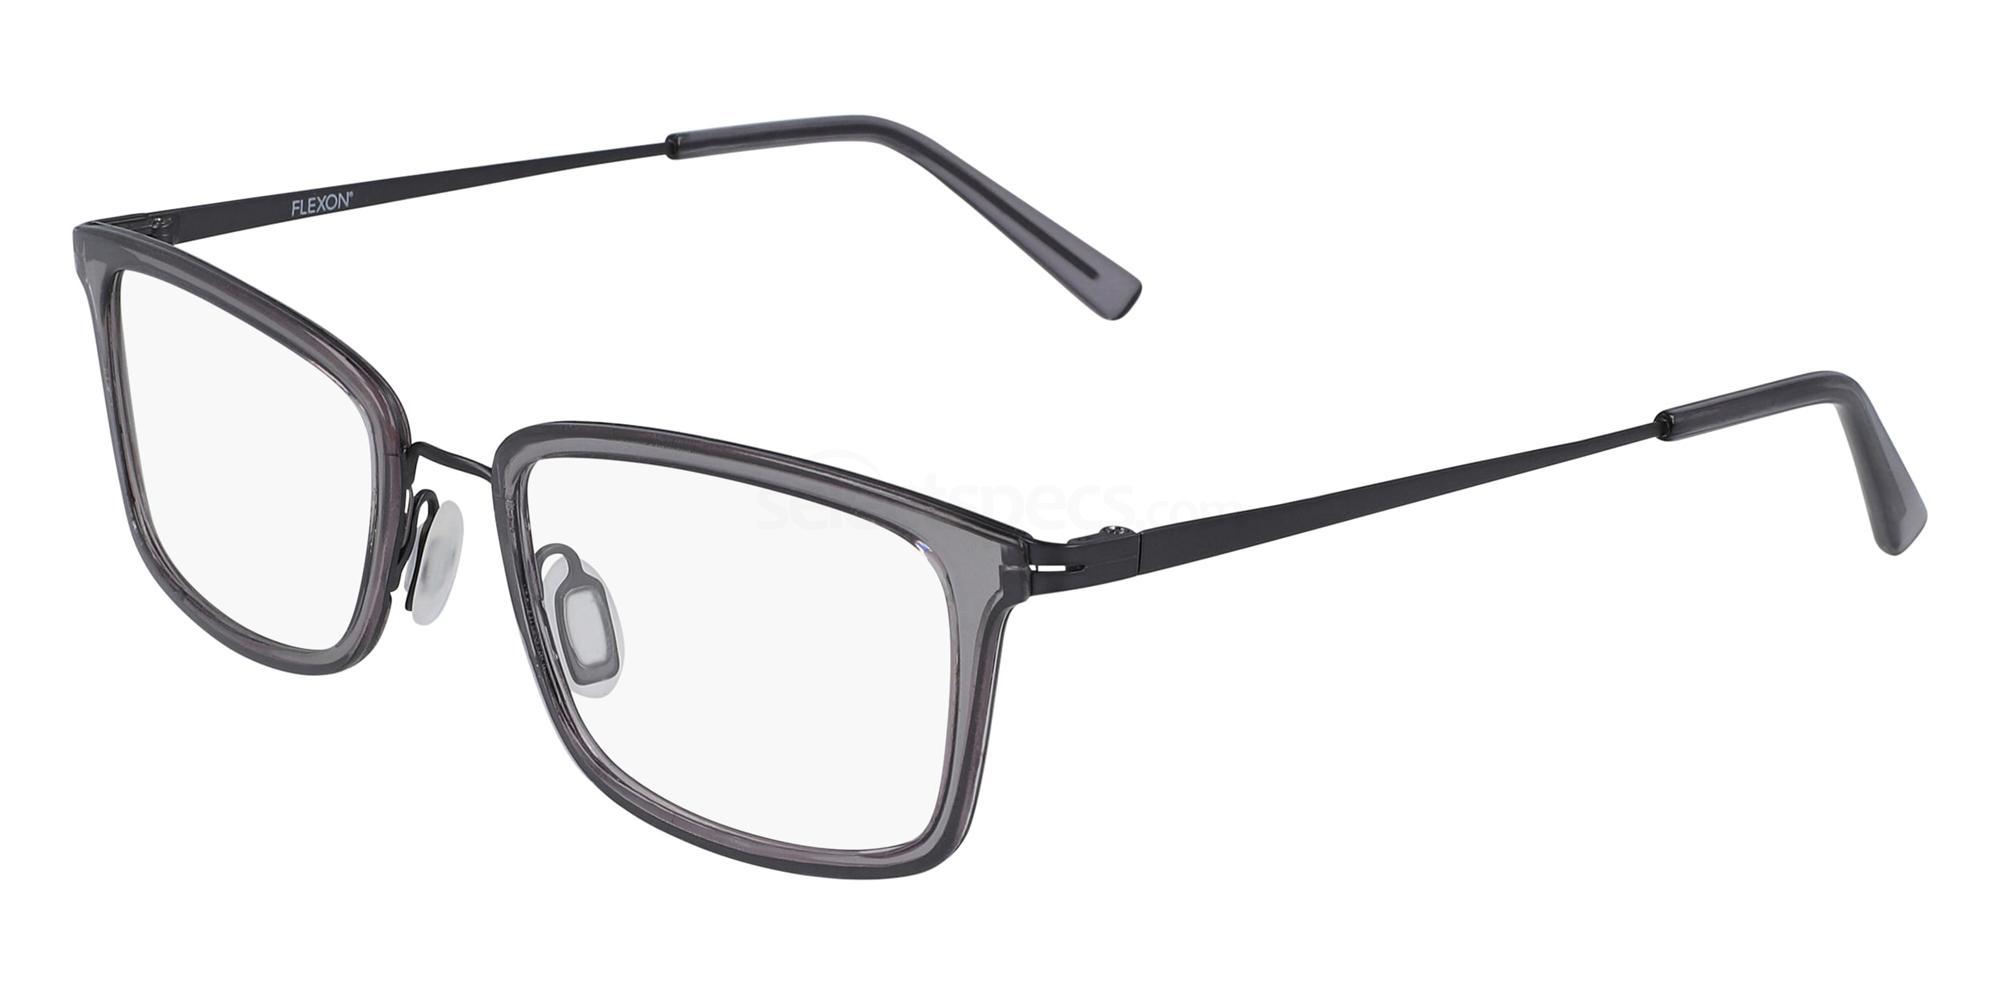 003 FLEXON W3022 Glasses, Flexon